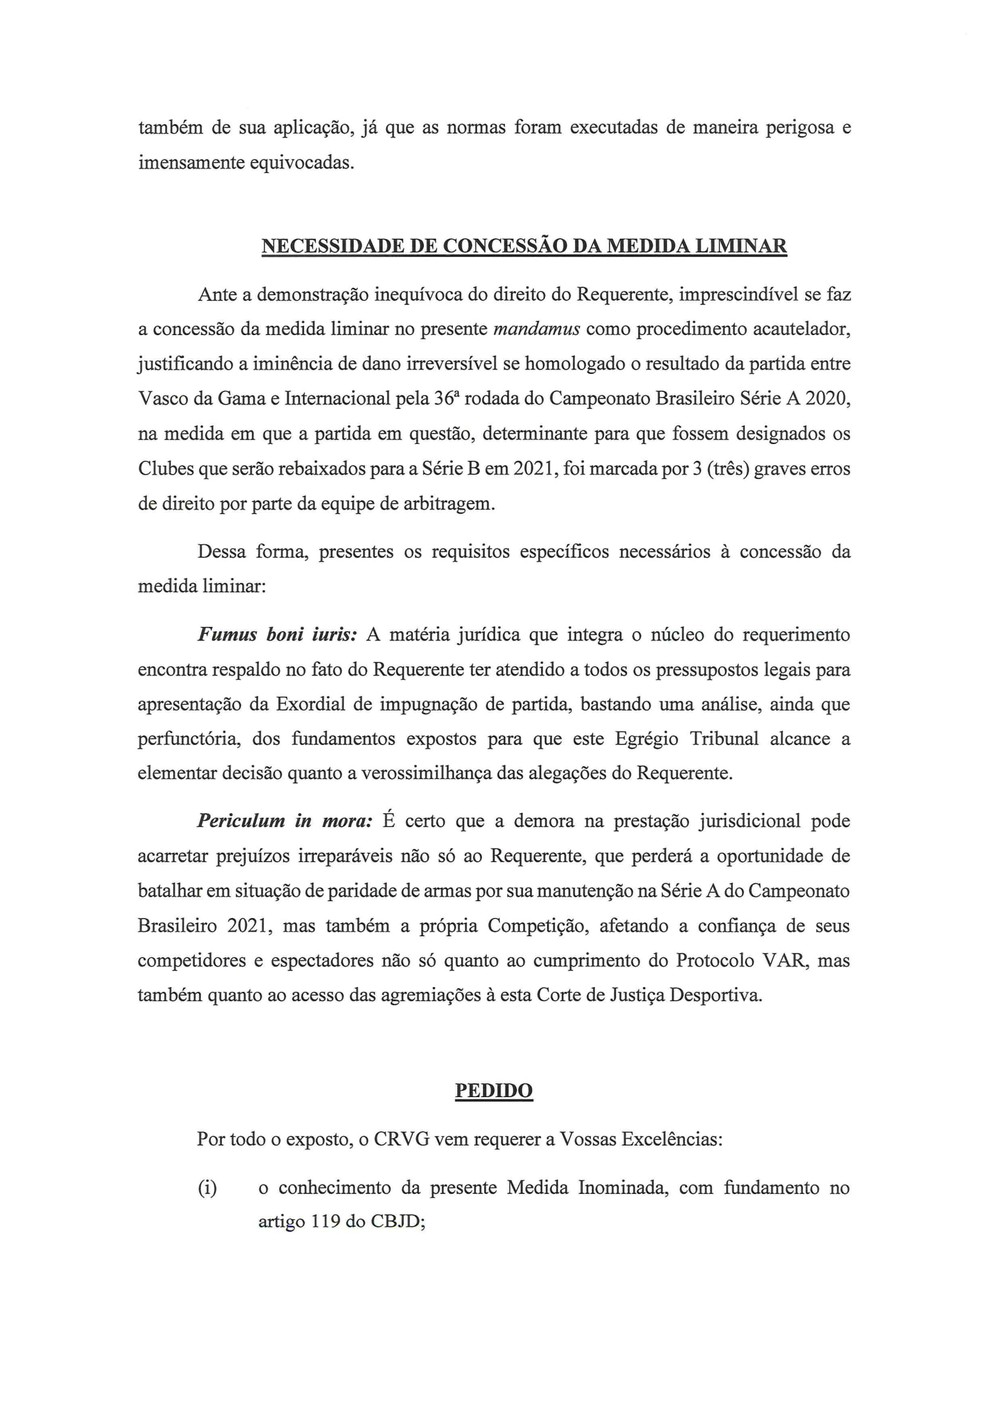 stjd-medida-inominada-vasco-x-inter-10